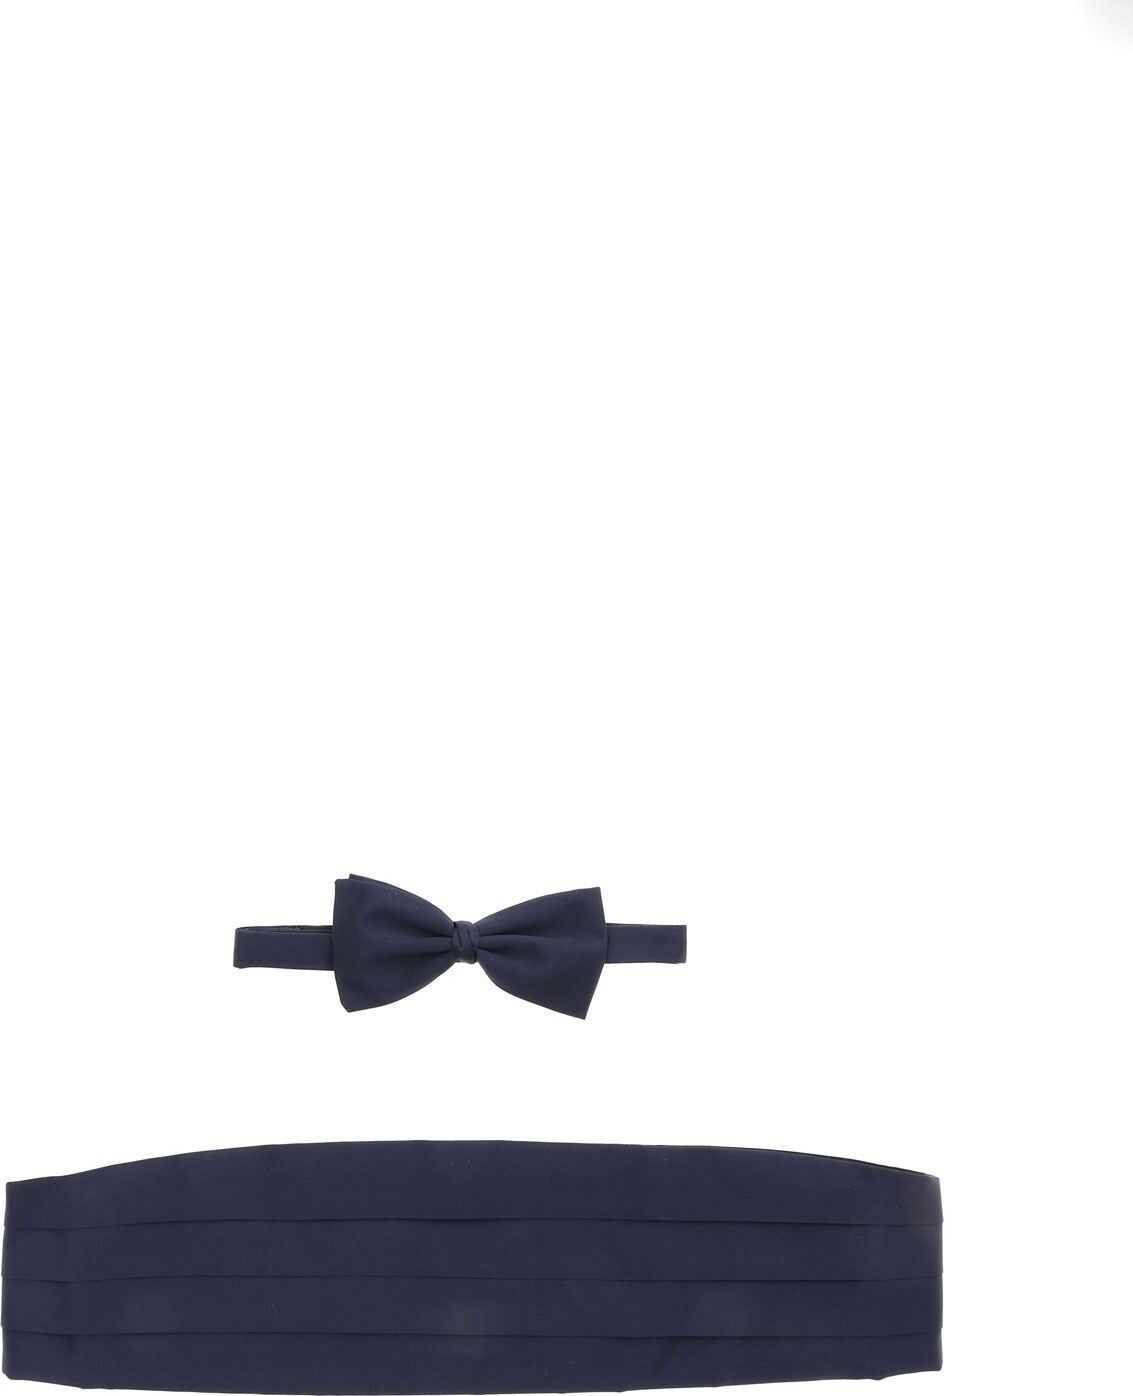 Ermenegildo Zegna Kit Tuxedo Belt And Blue Bow Tie Blue